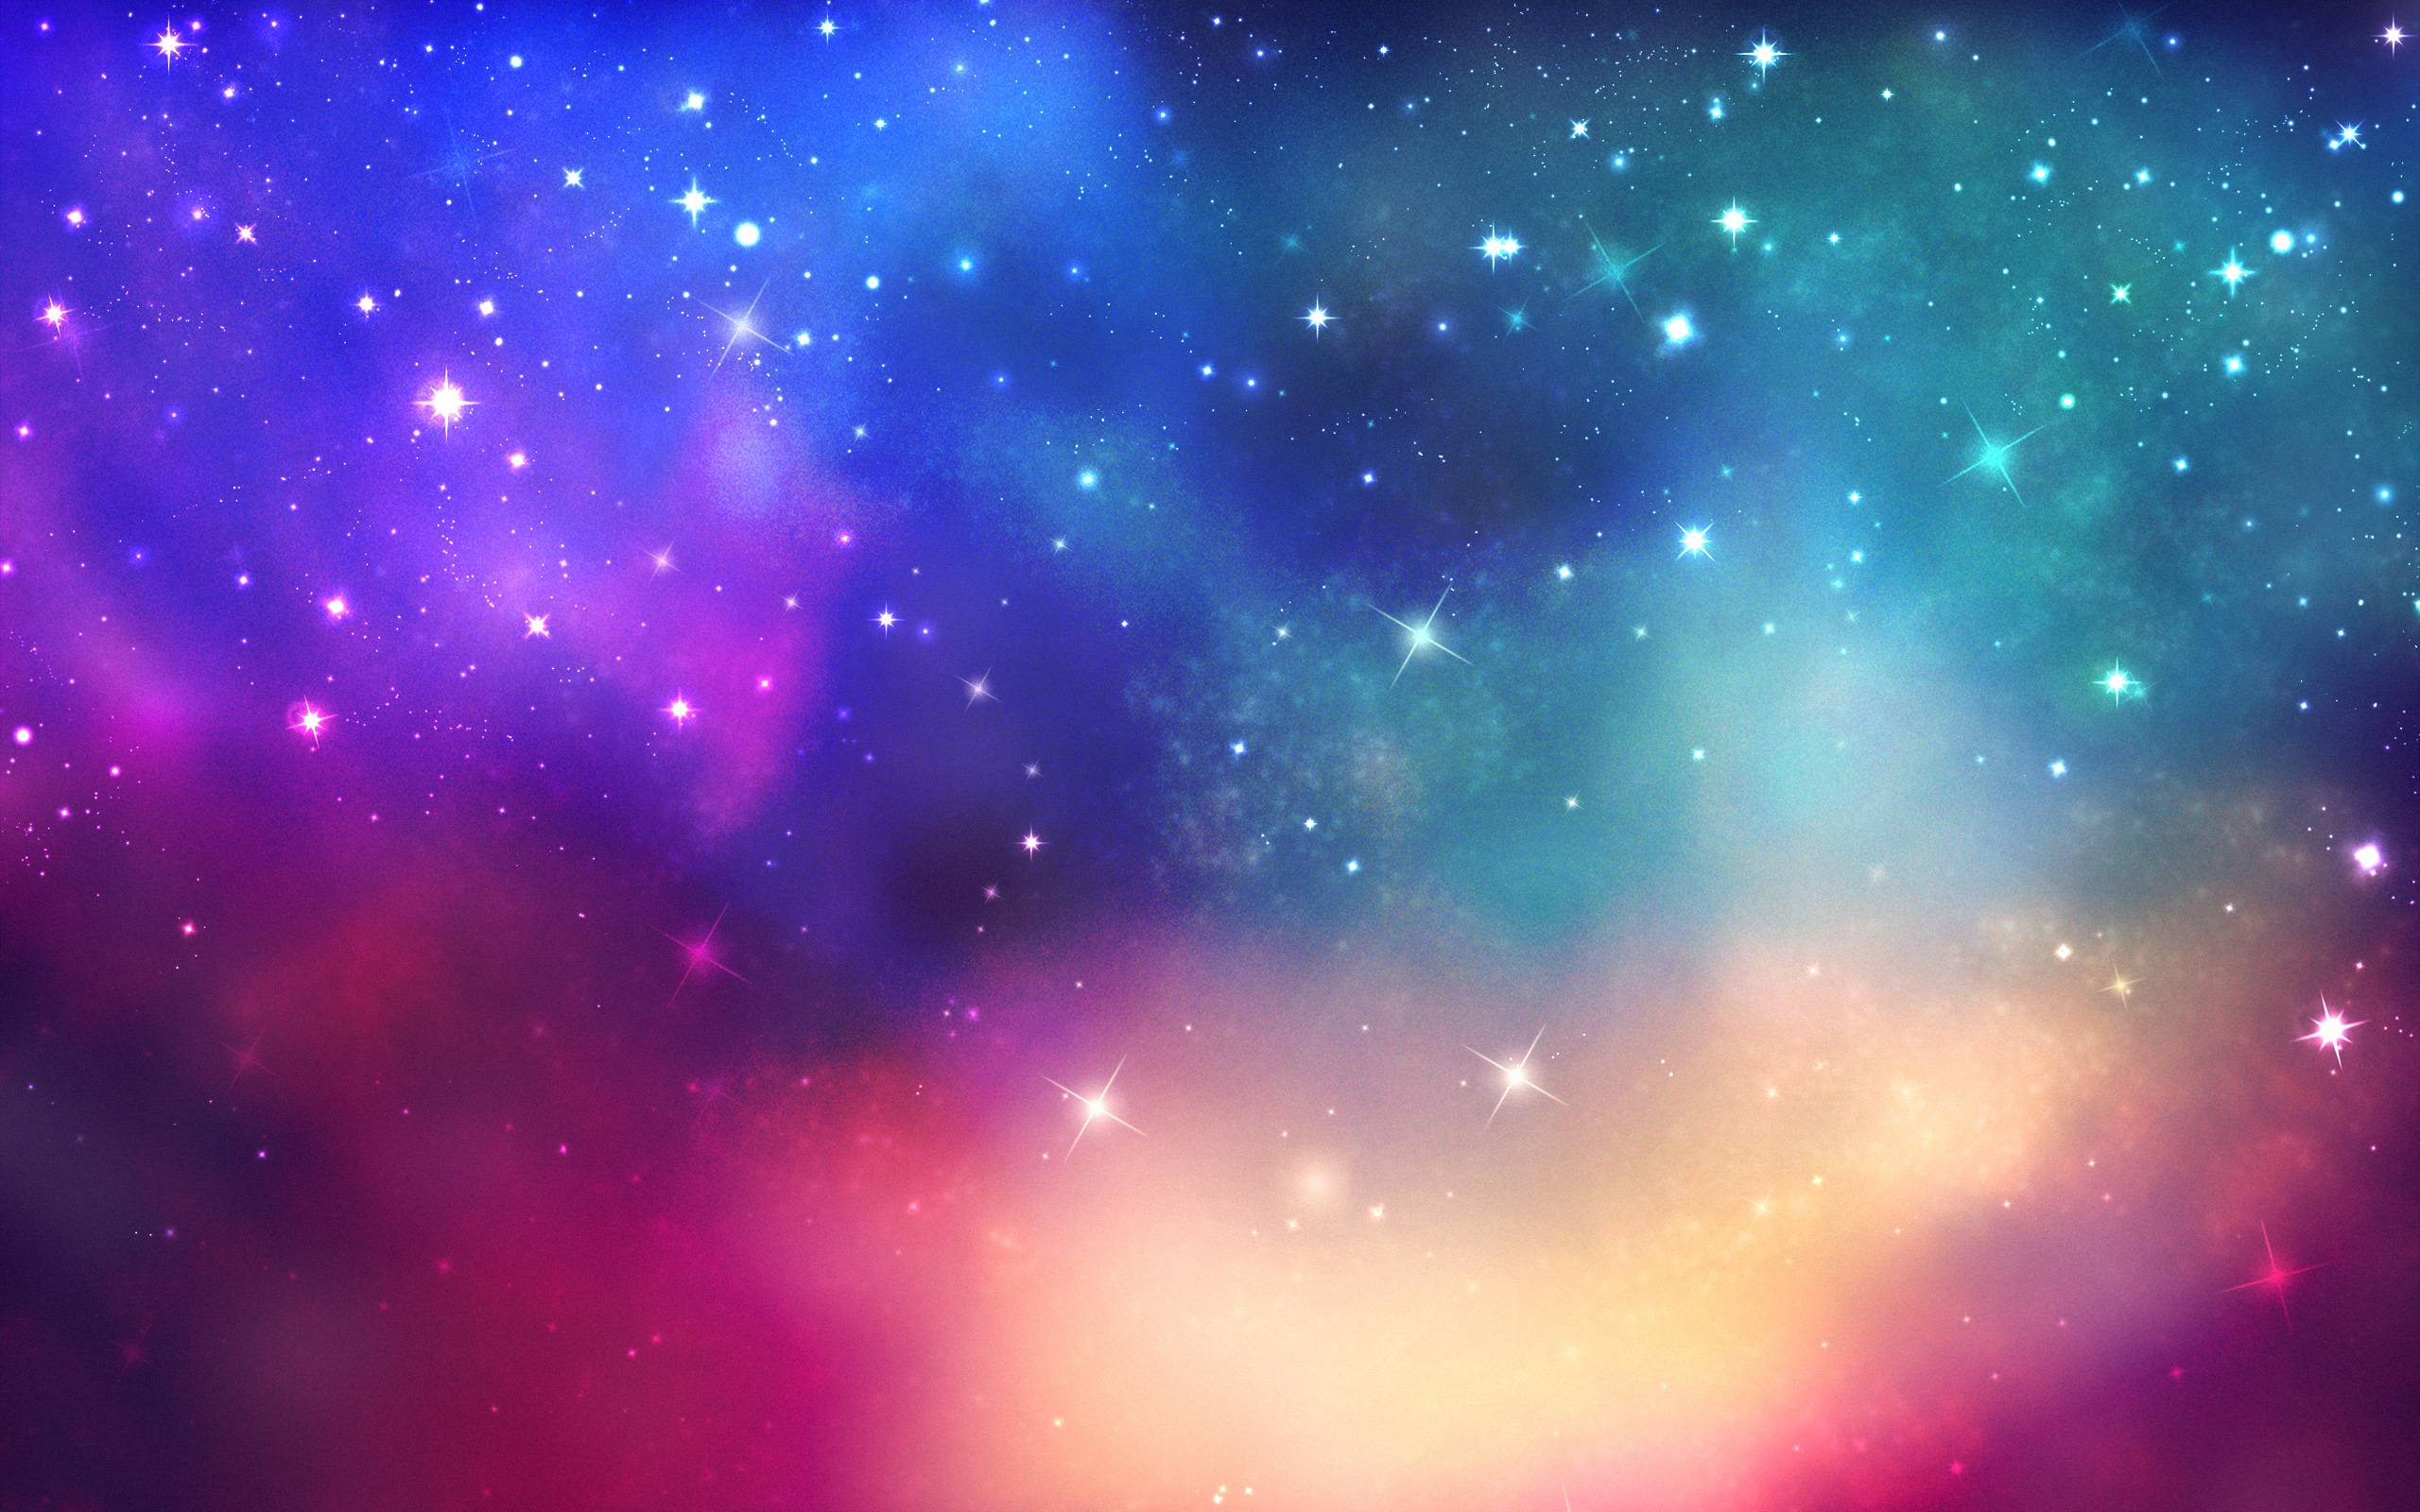 Star space wallpaper sf wallpaper purple stars wallpapers group 55 thecheapjerseys Gallery